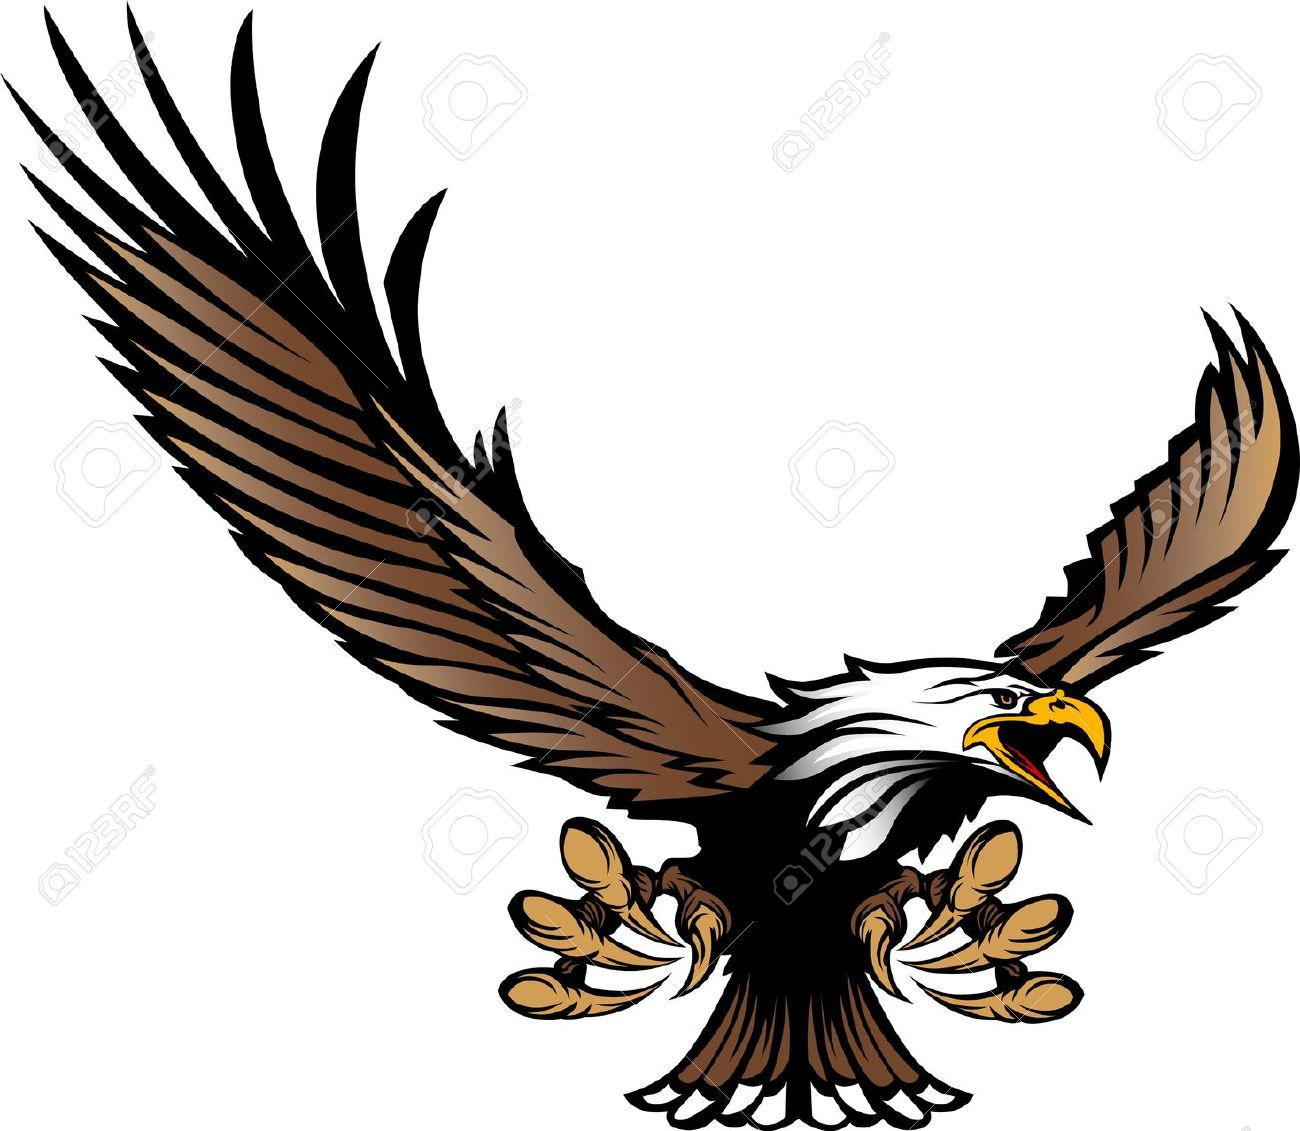 Hawk clipart #4, Download drawings